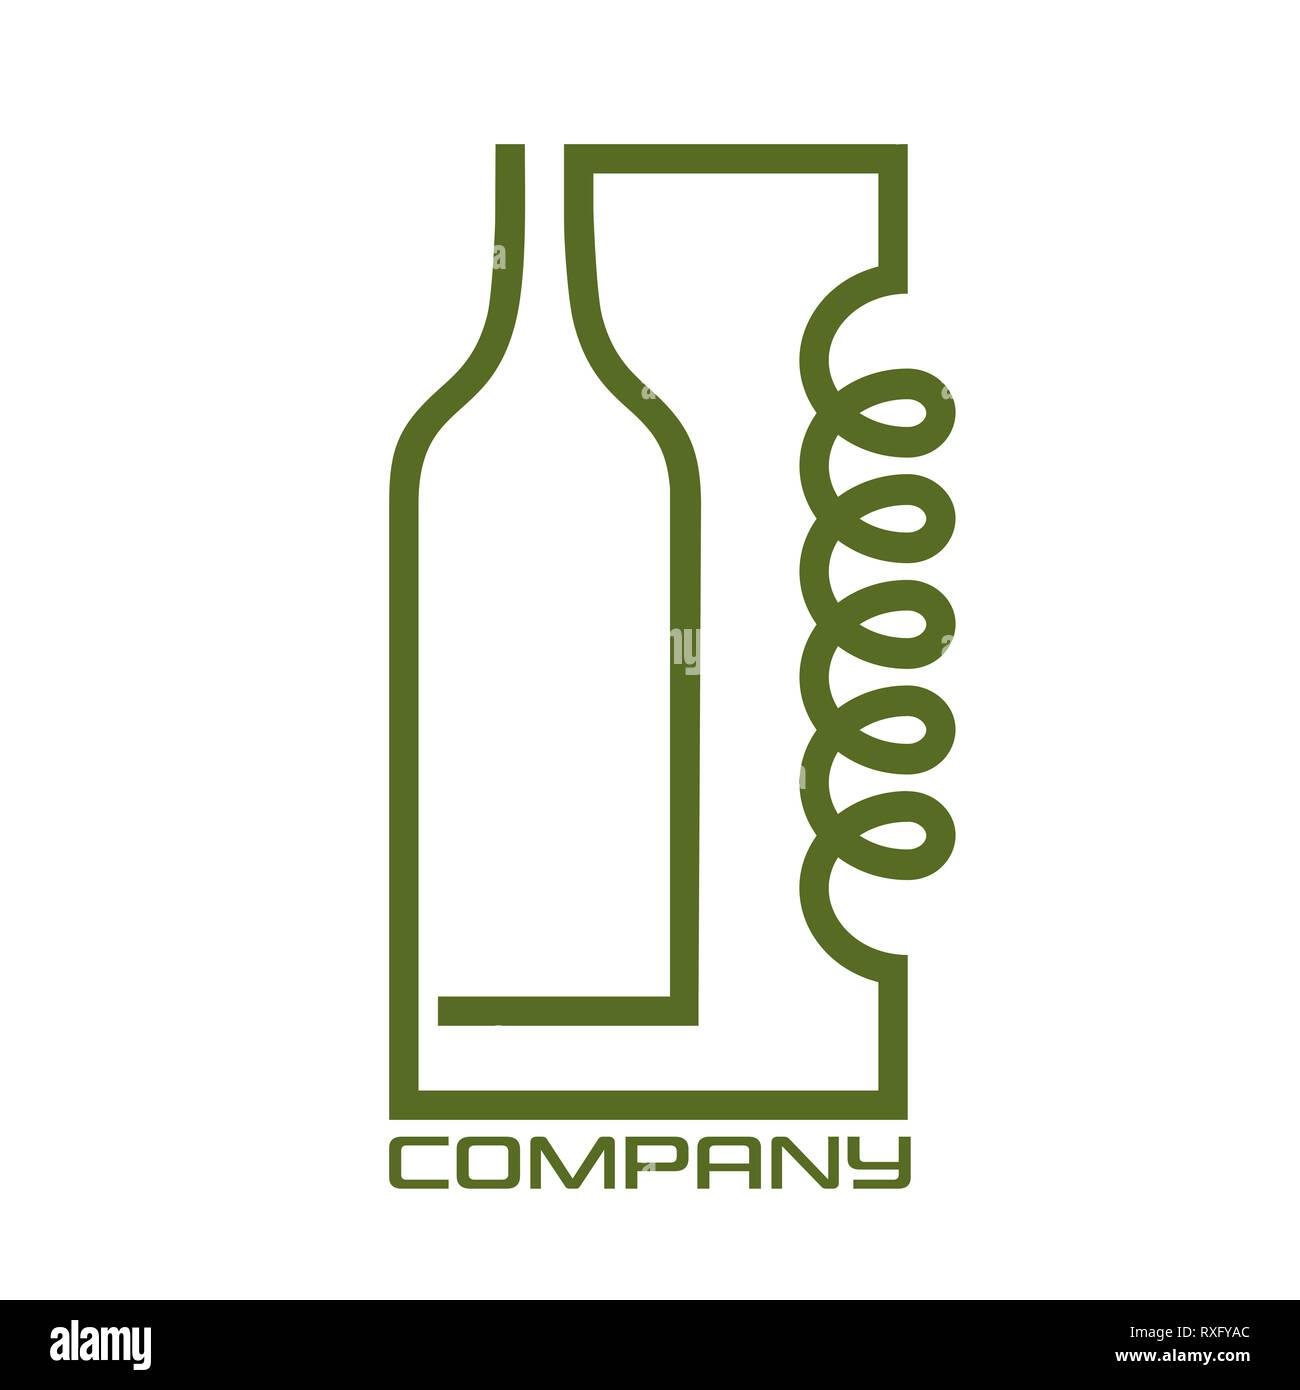 Distiller and bottle logo - Stock Image